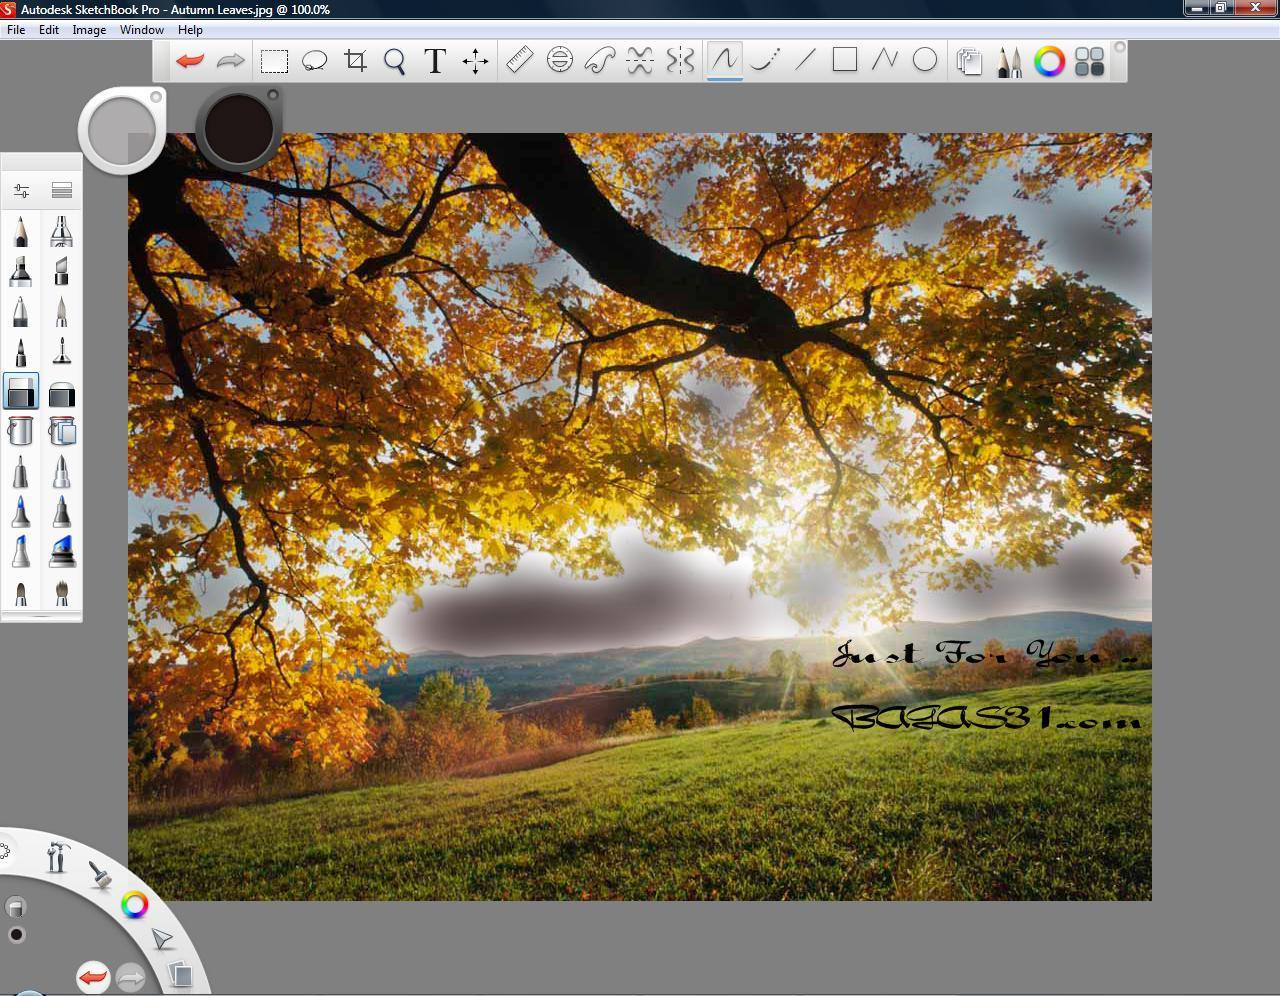 Autodesk Sketchbook Pro 2012 v6.0.1 Full Serial - BAGAS31.com